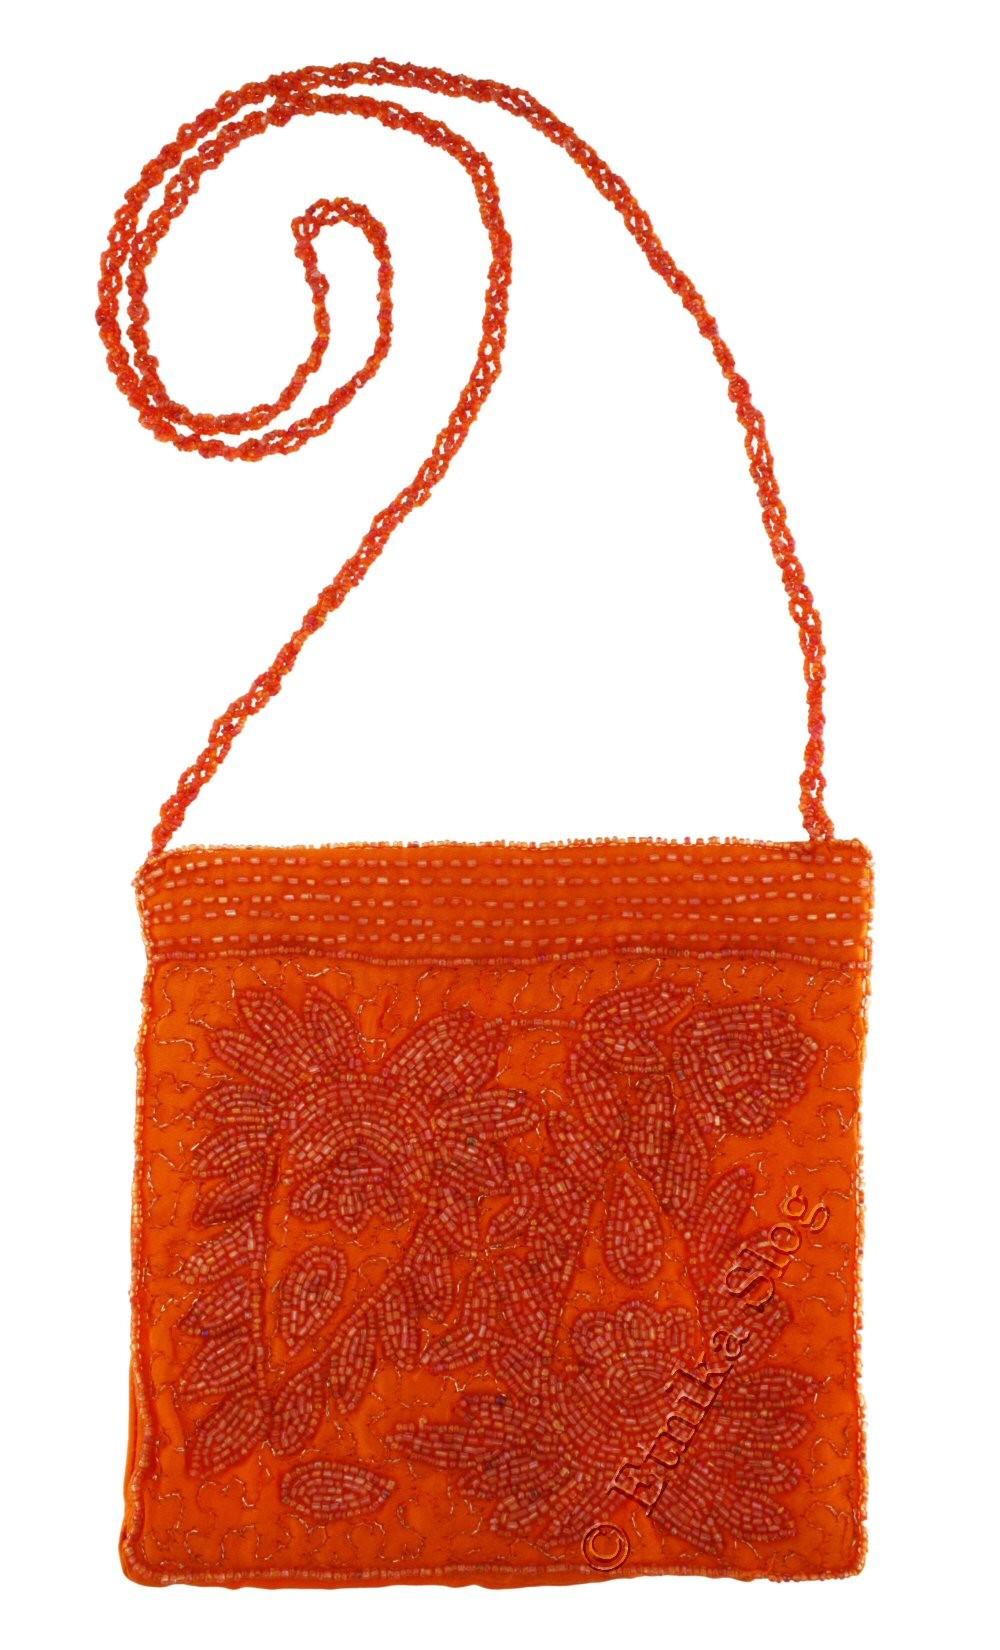 SMALL SHOLDER BAGS BS-PE01/03 - Oriente Import S.r.l.